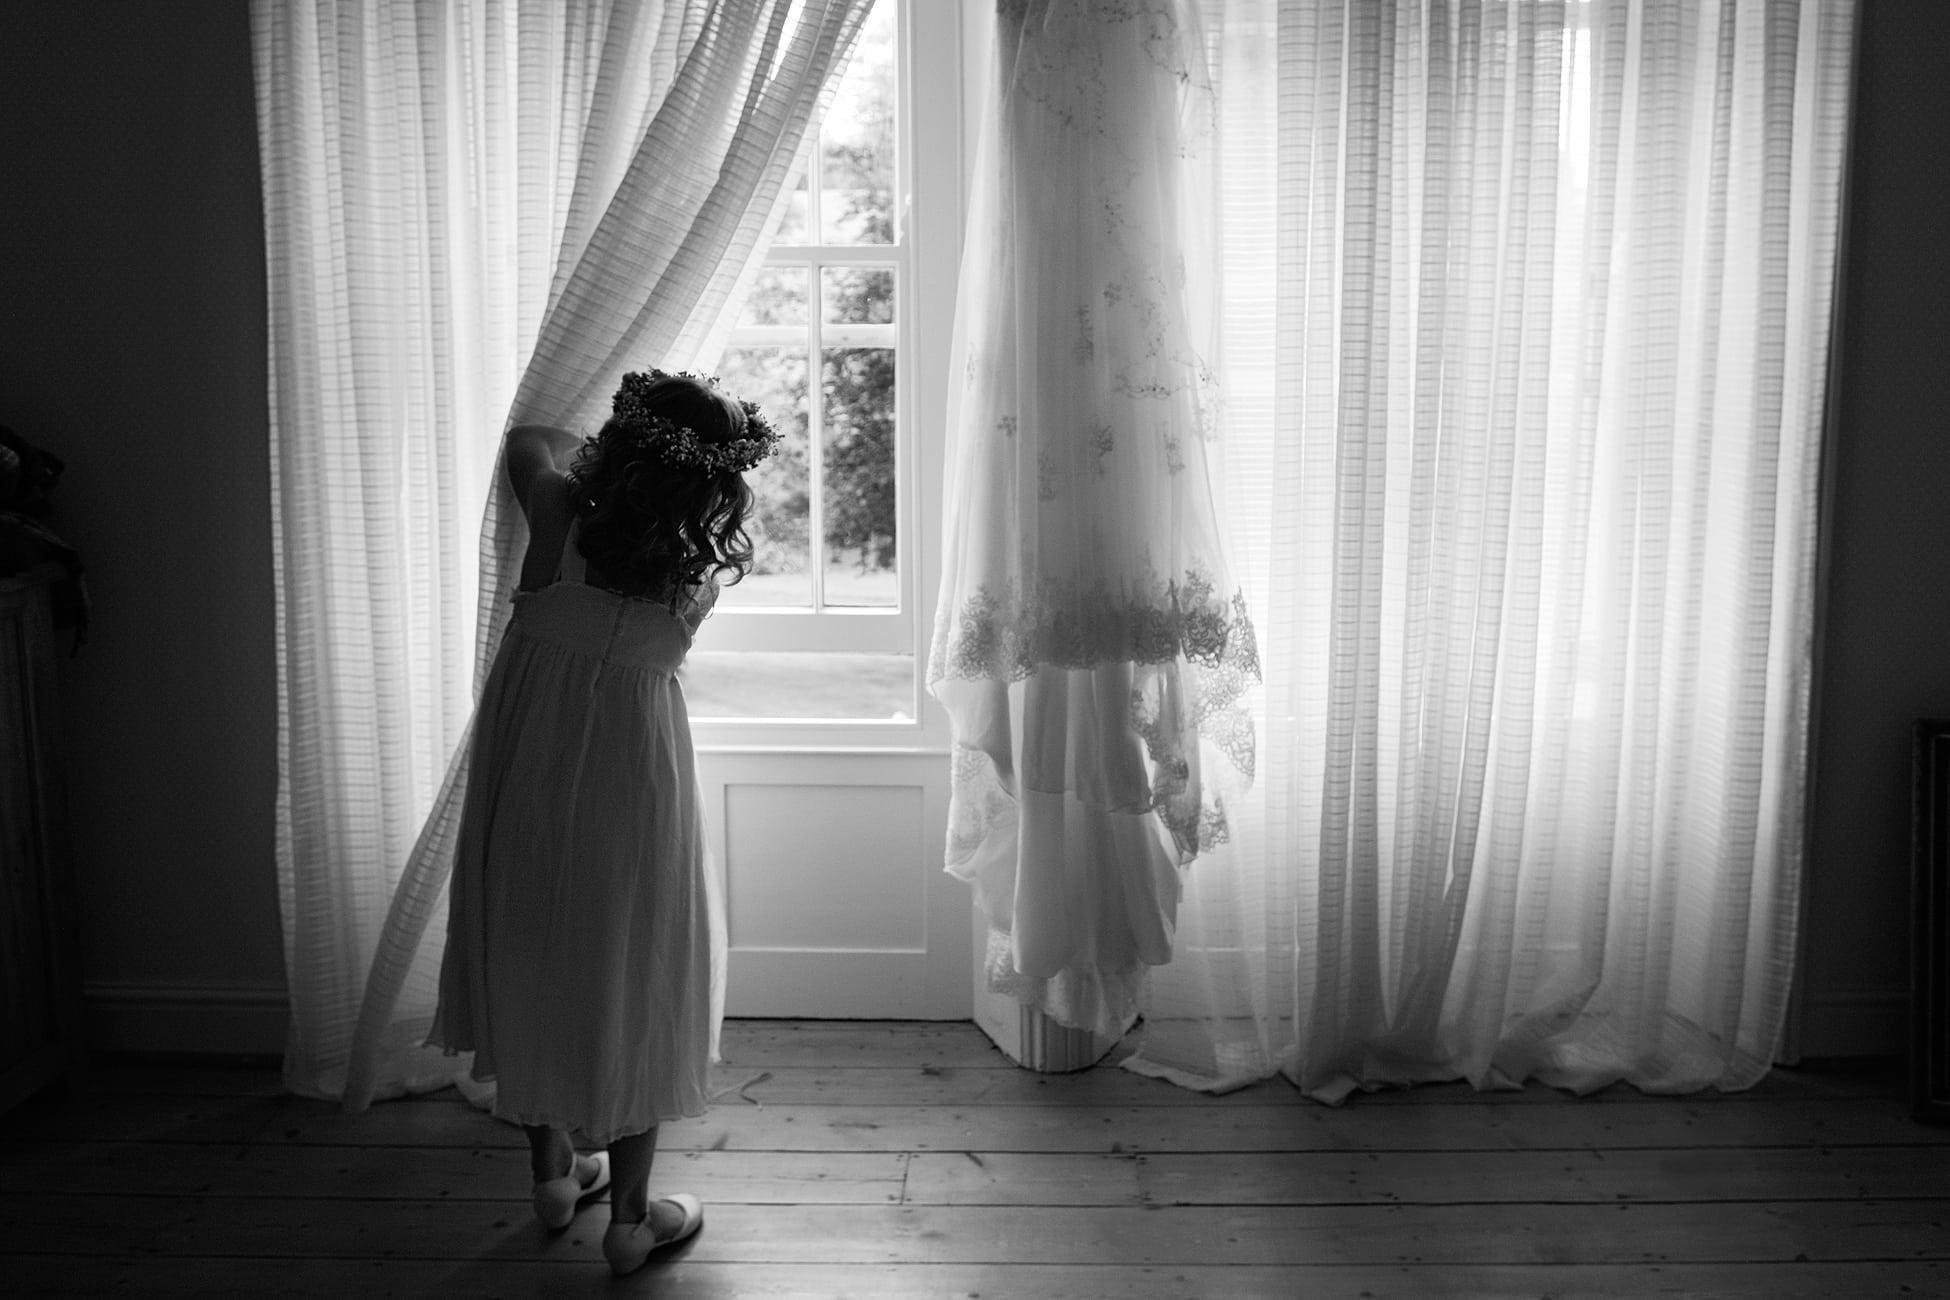 peeking-out-of-the-window